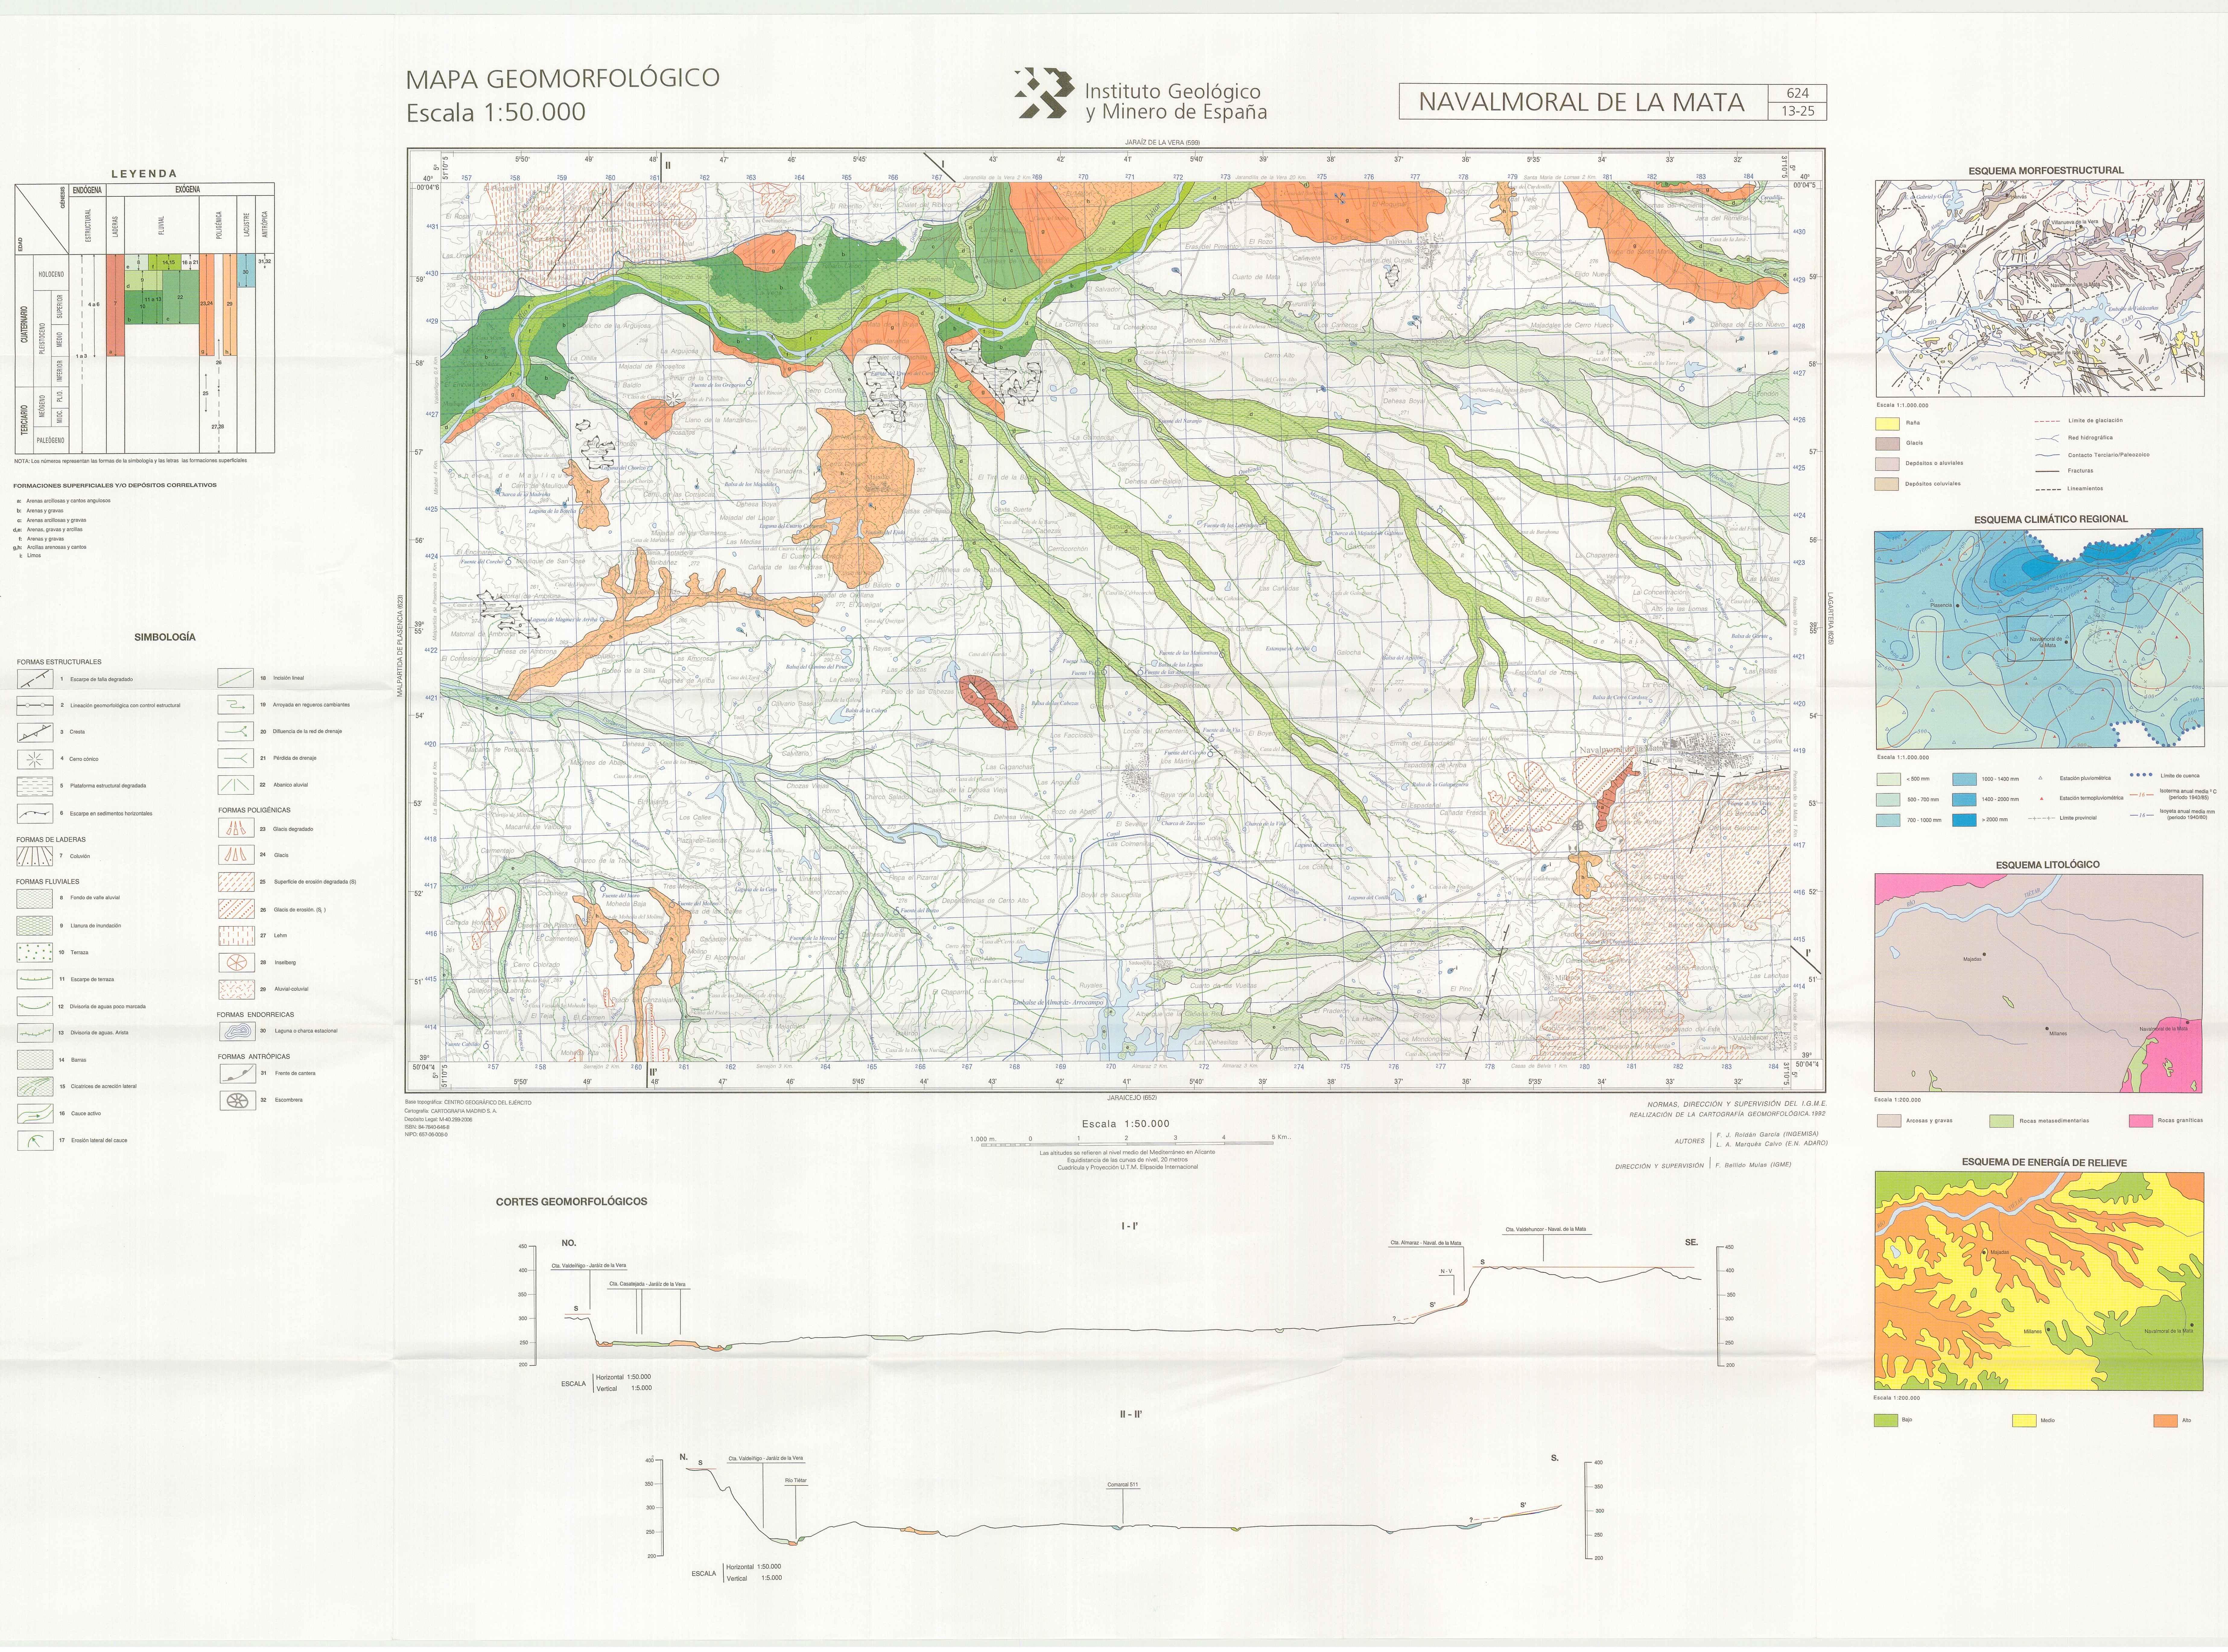 Mapa Geomorfologico E 1 50 000 Hoja 624 Navalmoral De La Mata